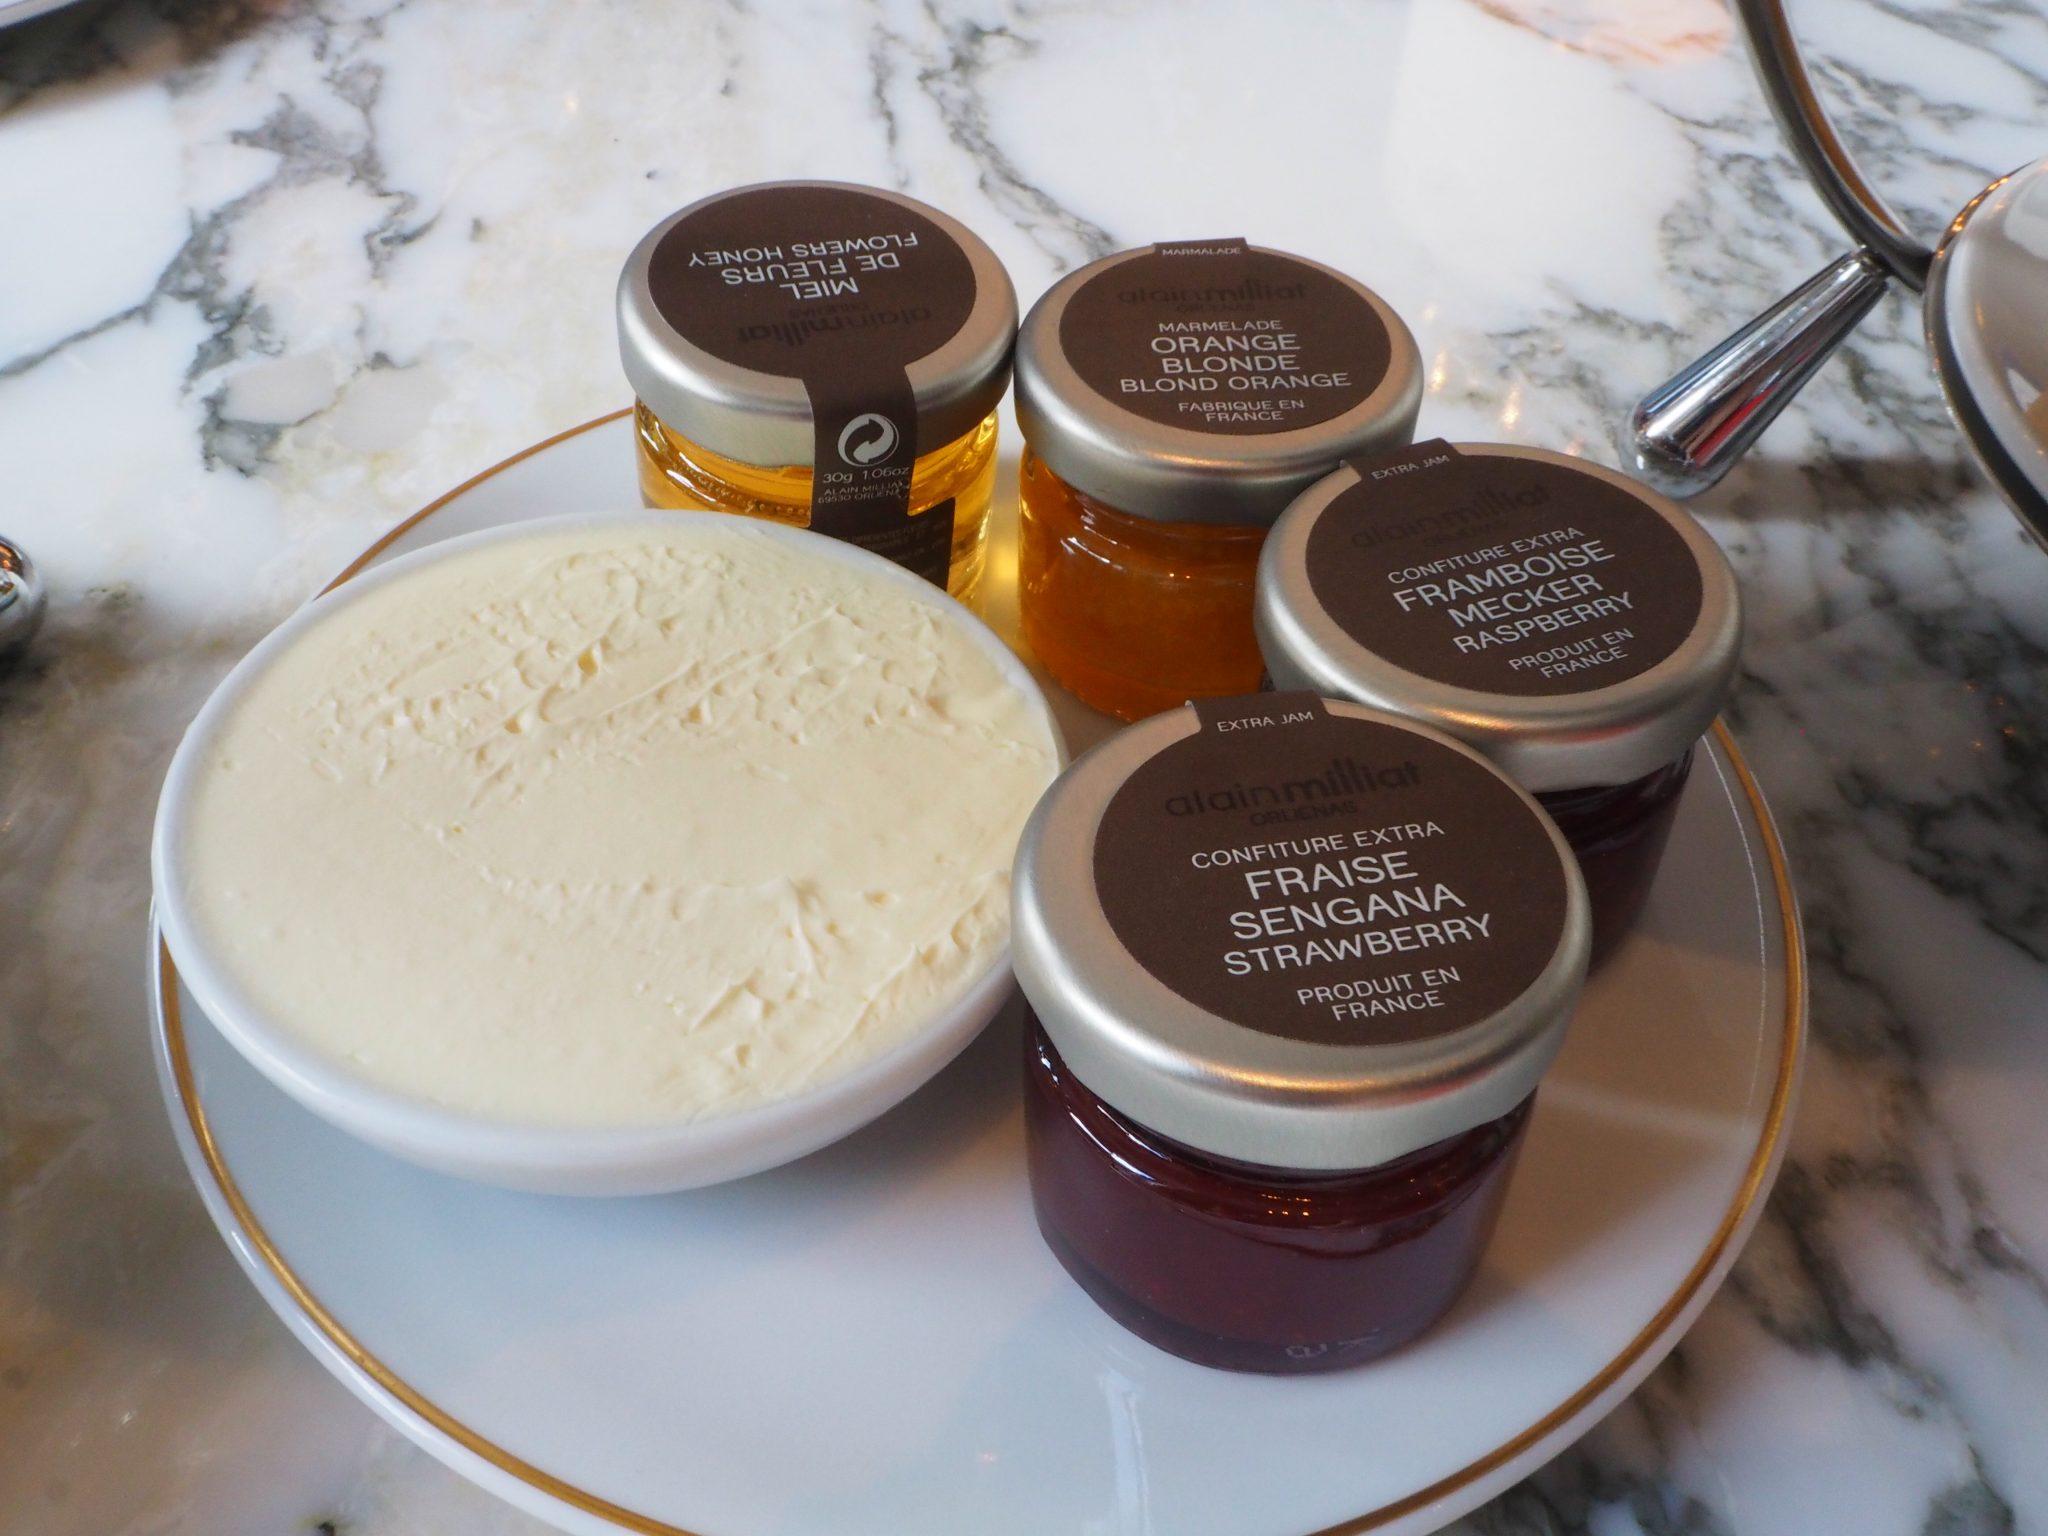 Clotted cream, Raspberry, strawberry & marmalade jam and Honey.